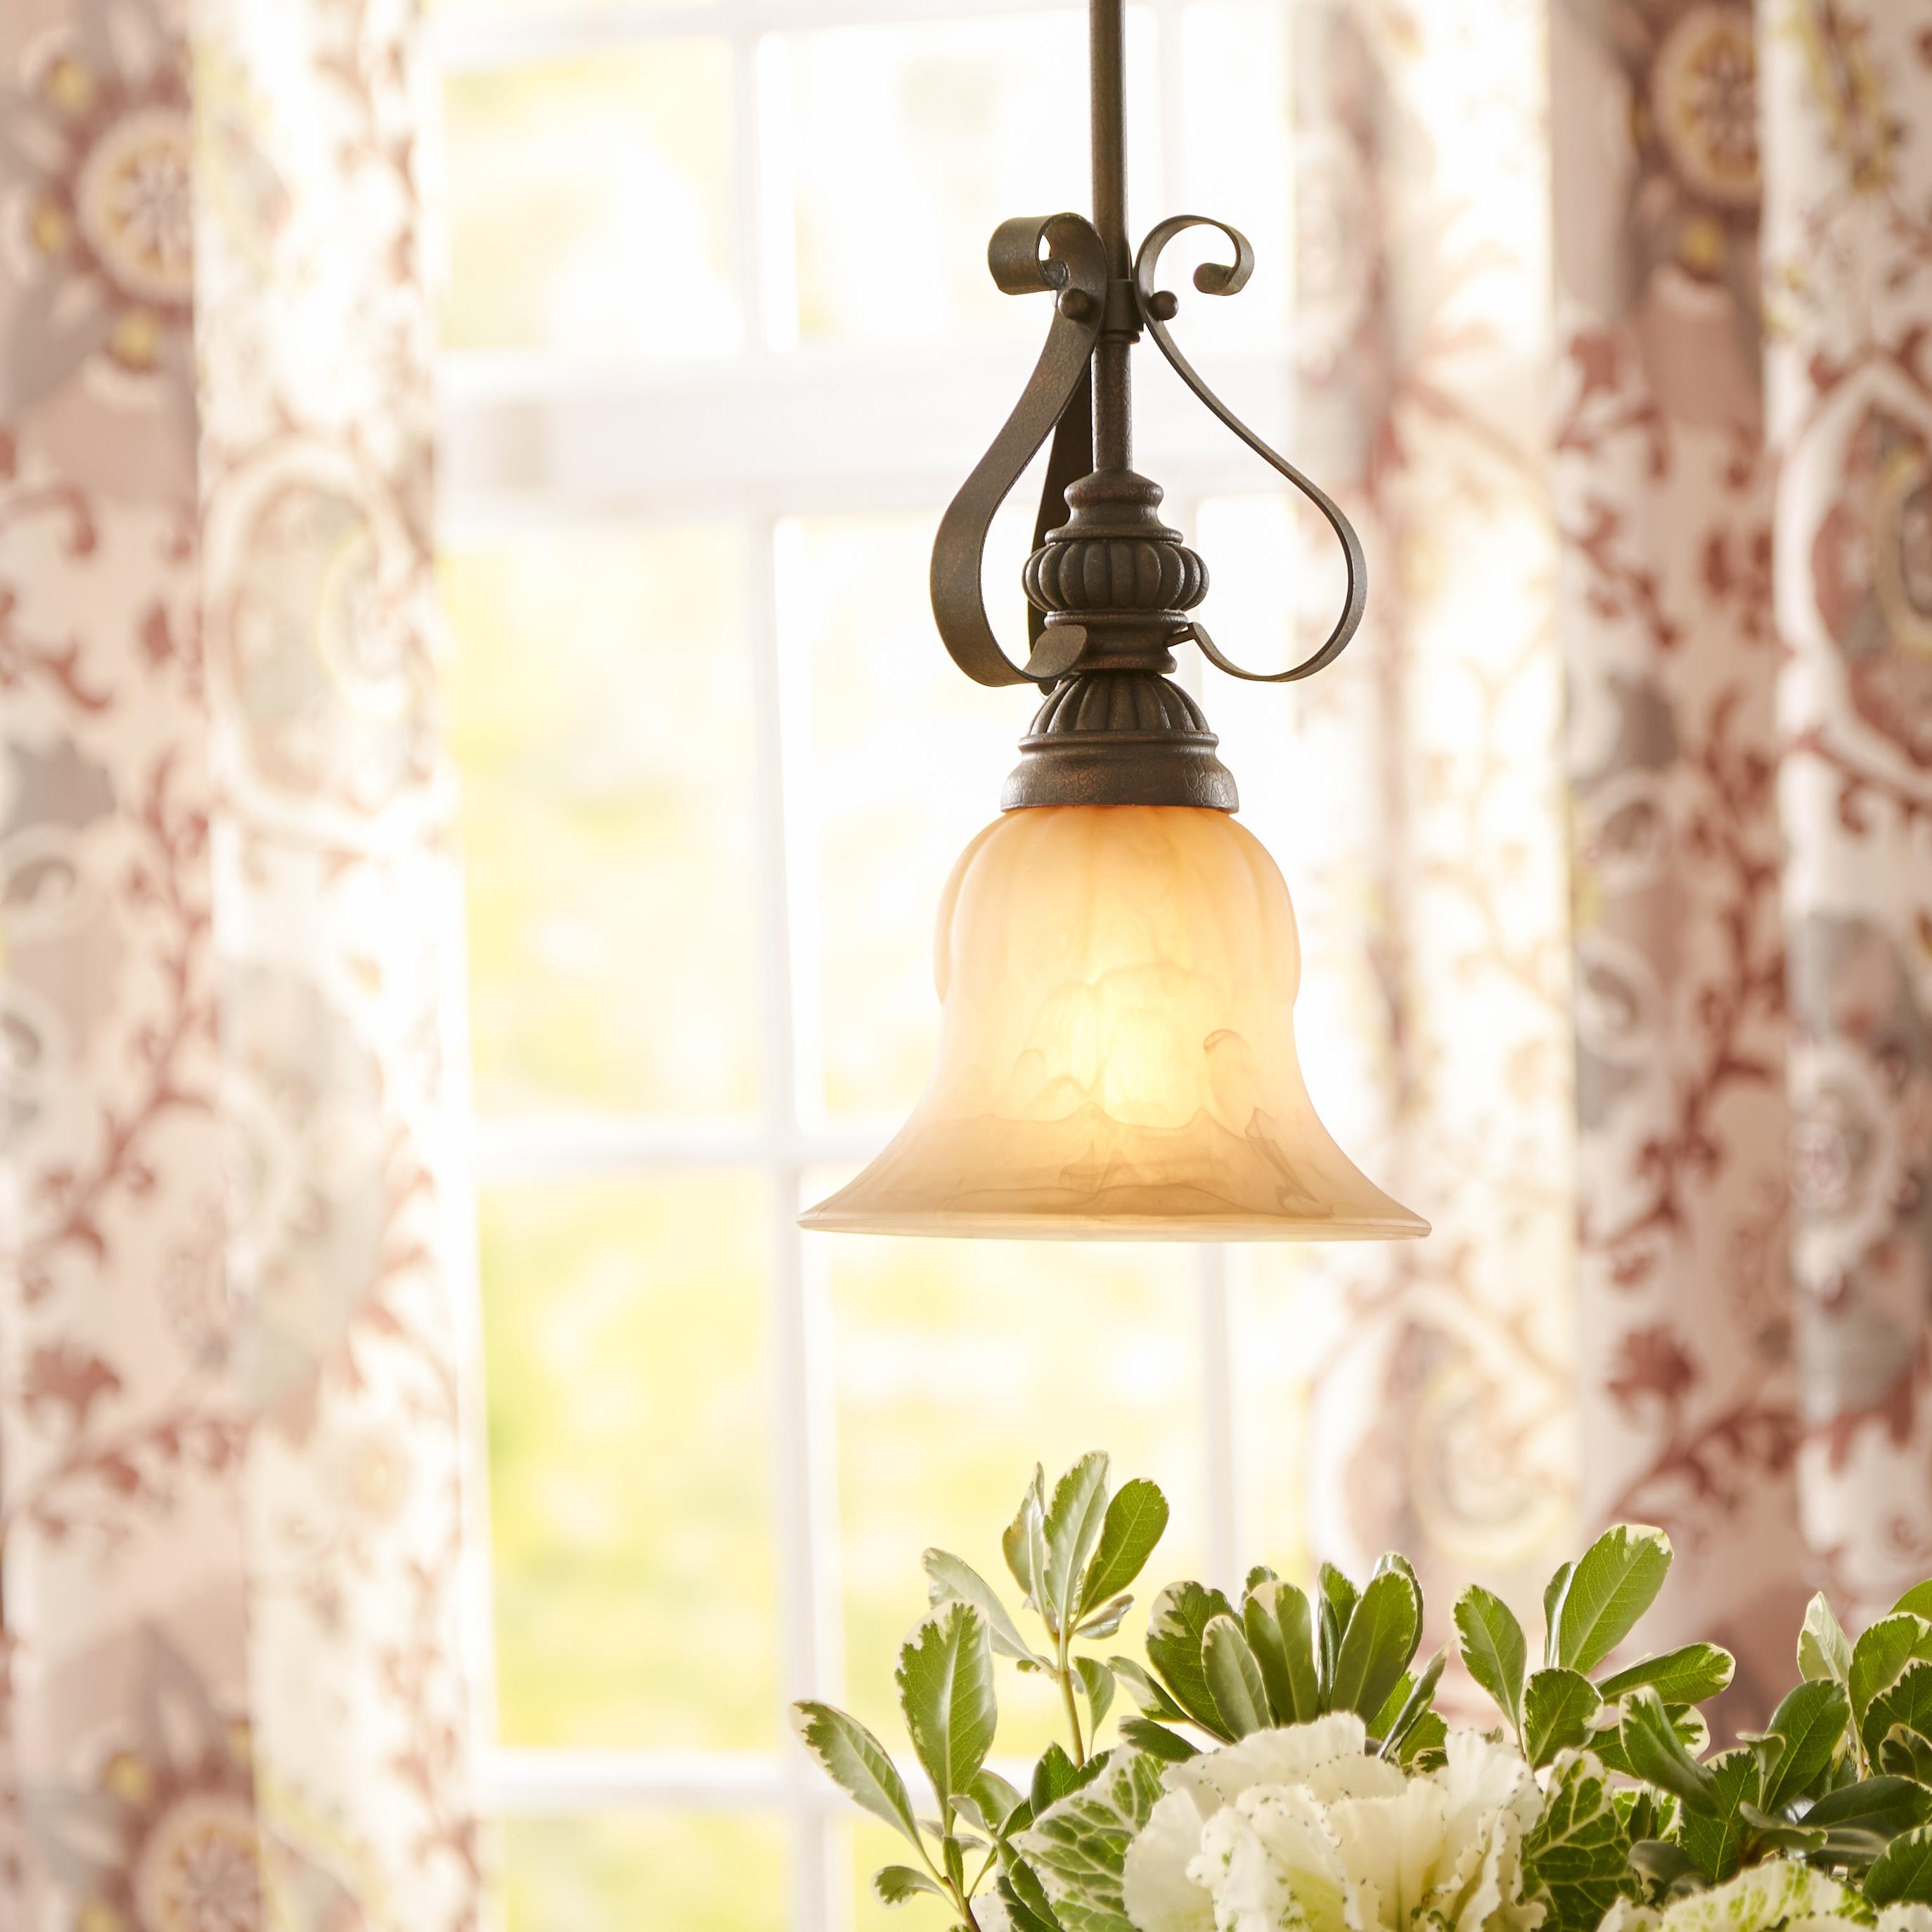 2019 Grullon Scroll 1 Light Single Bell Pendant In Grullon Scroll 1 Light Single Bell Pendants (View 1 of 20)